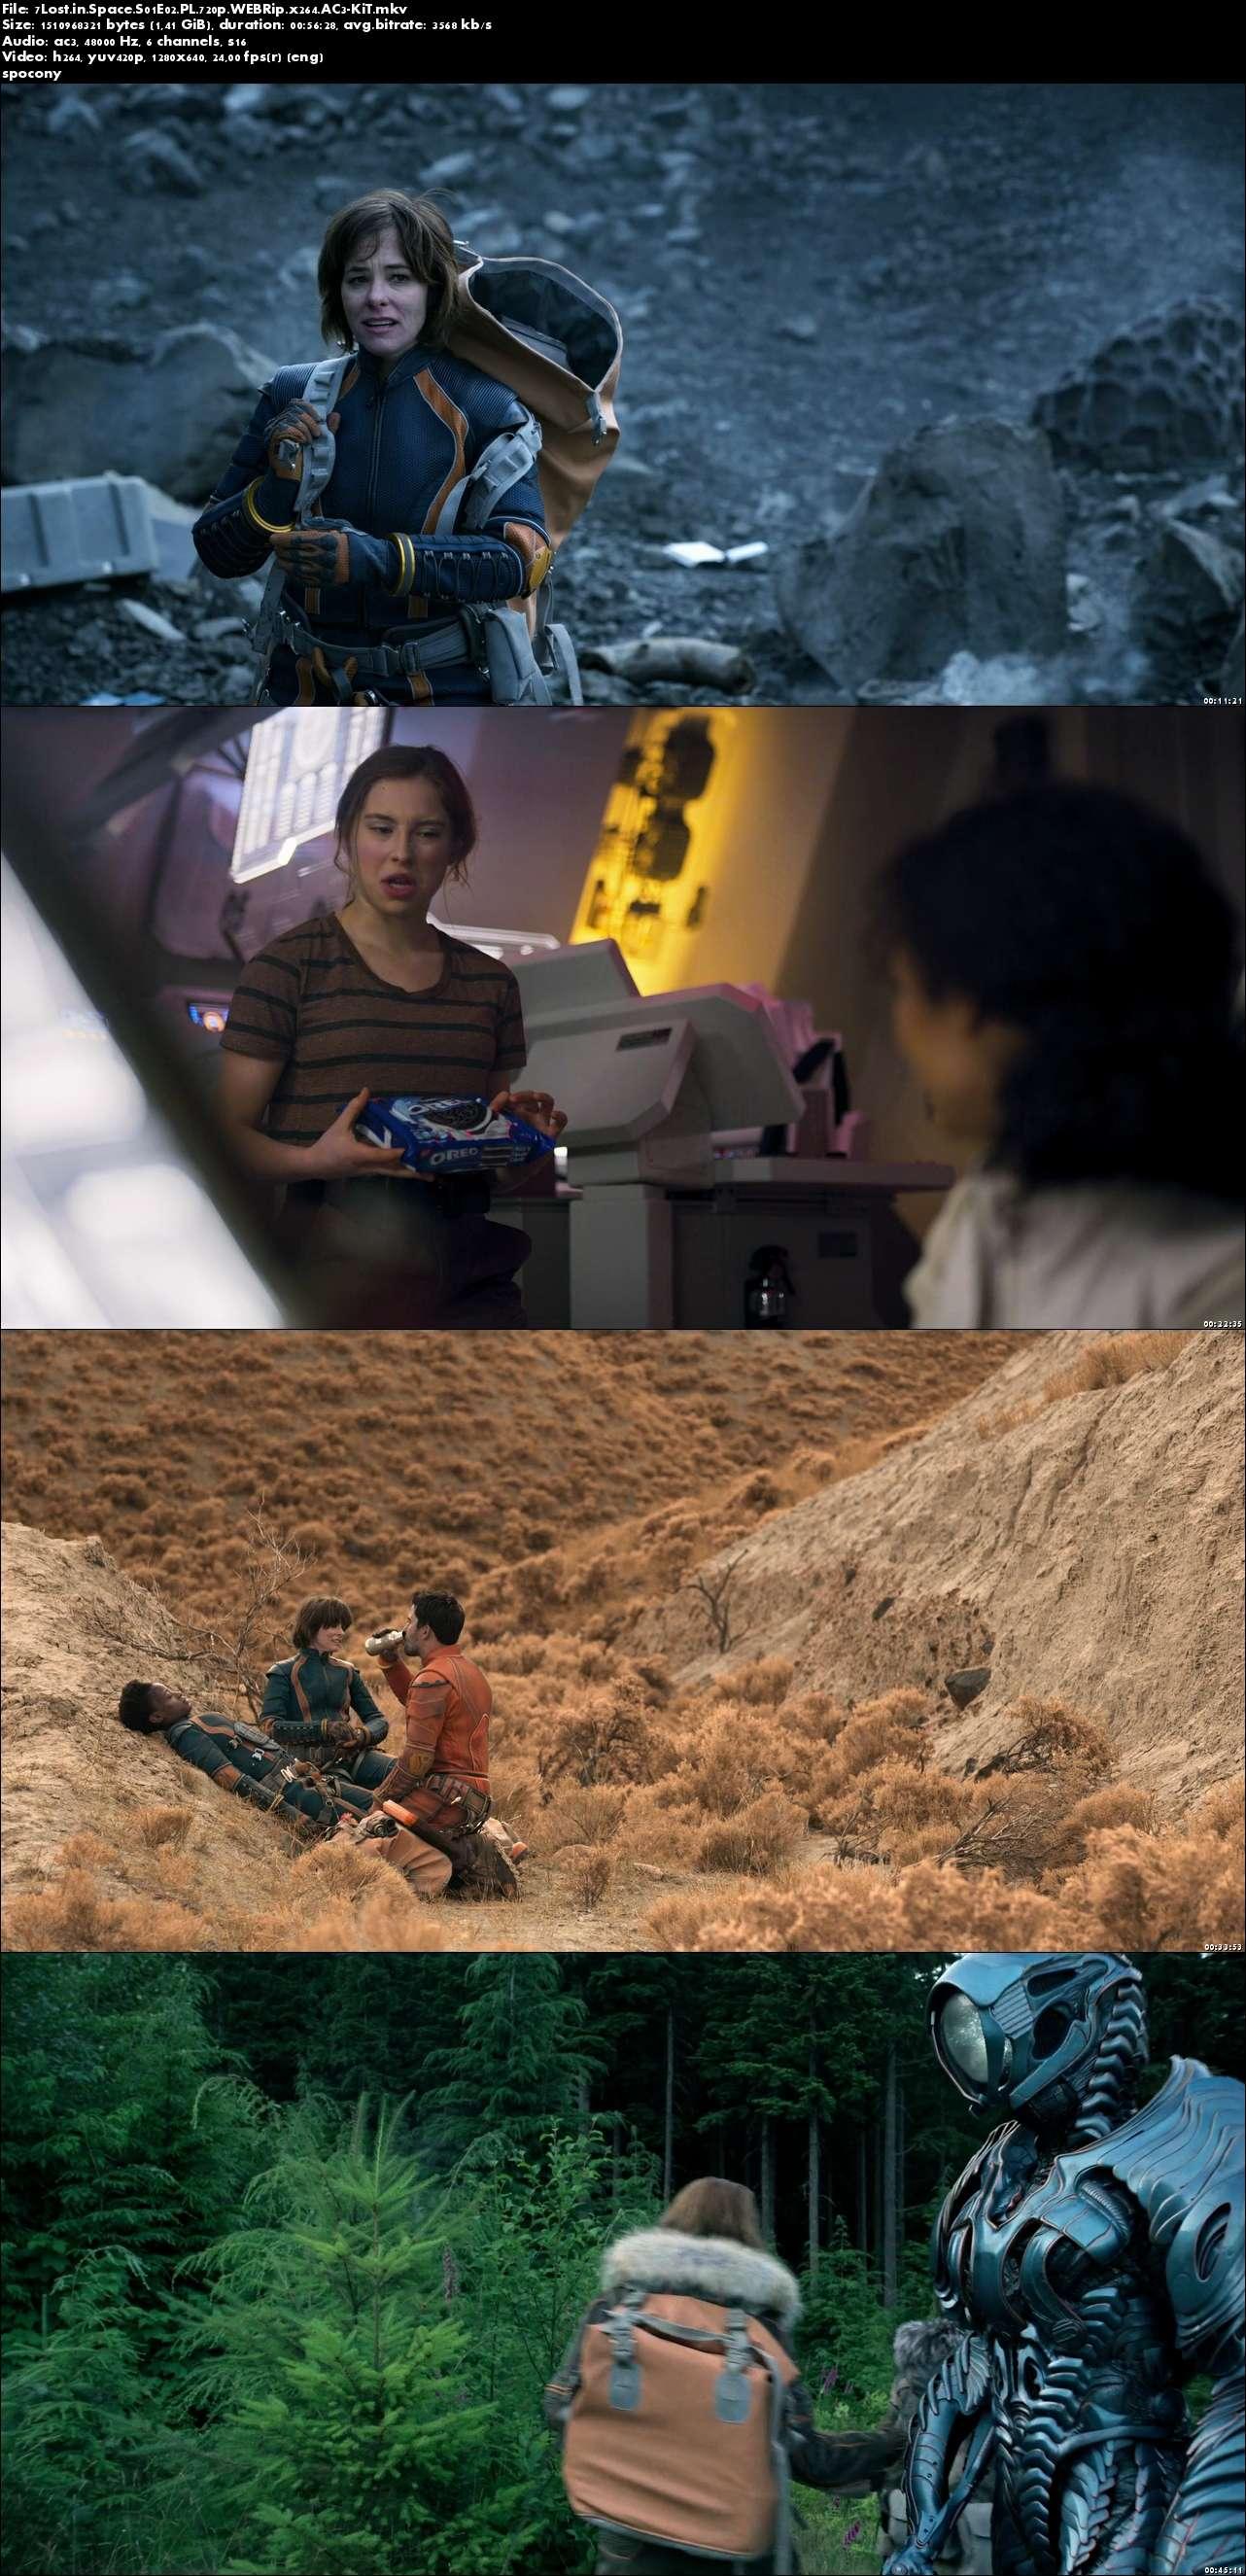 Zagubieni w kosmosie / Lost in Space (2018) {Sezon 1} (Pełen sezon) PL.720p.WEBRip.x264.AC3-KiT [Lektor PL]